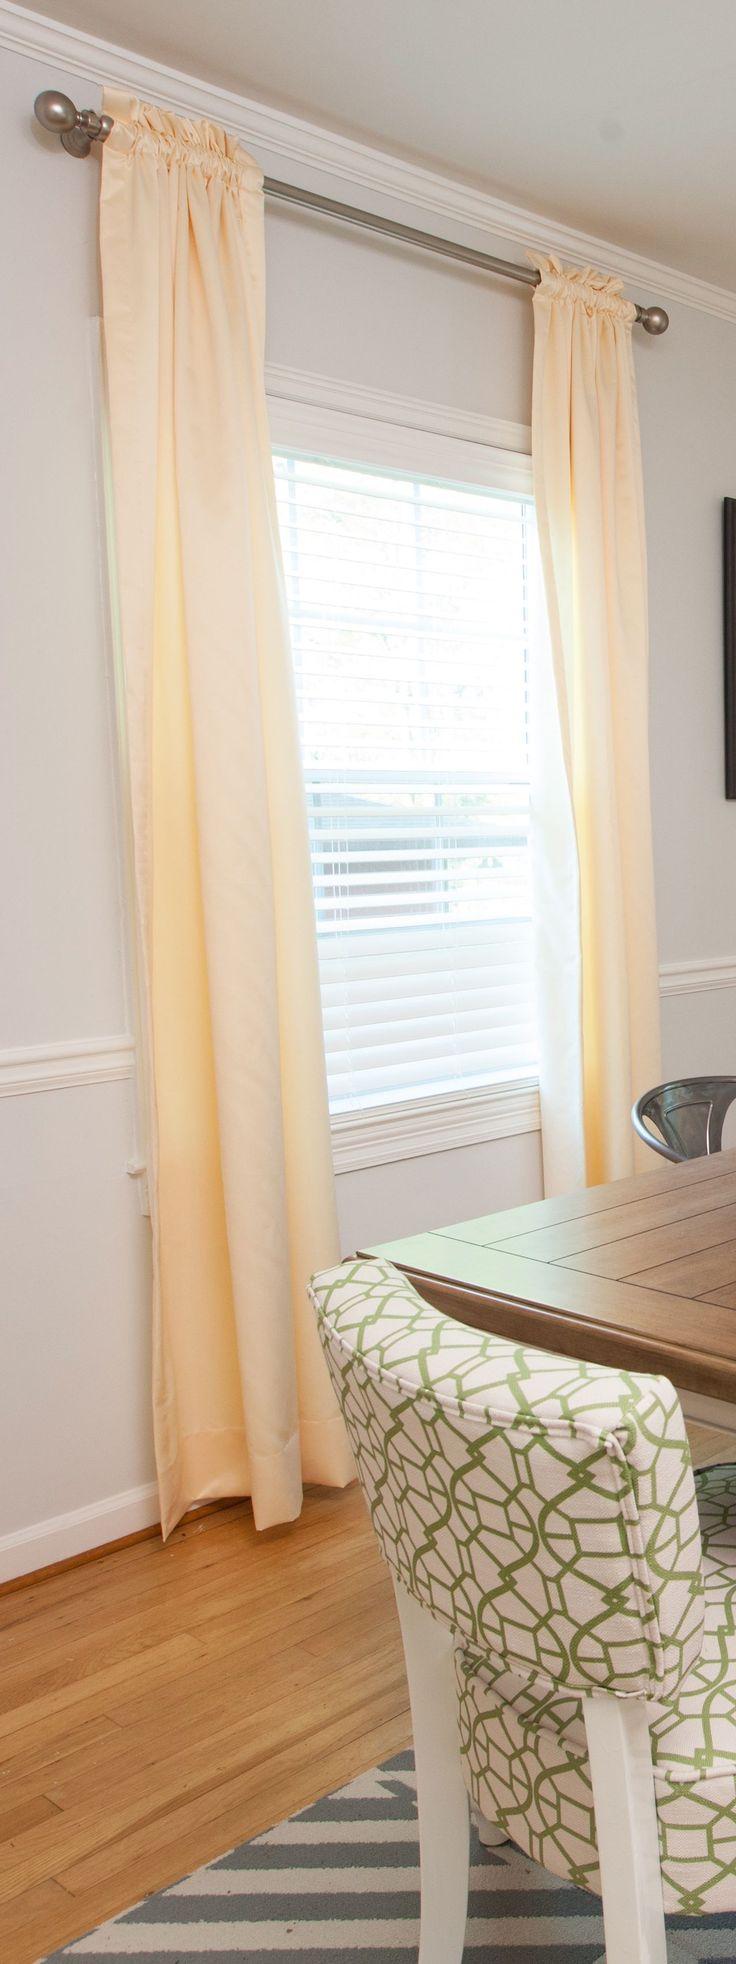 "Dining Room | Blinds - Faux Wood.2"" Slat Milk White – 85058, Curtains - Mercedes Iridium 90027 | BUDGET BLINDS"